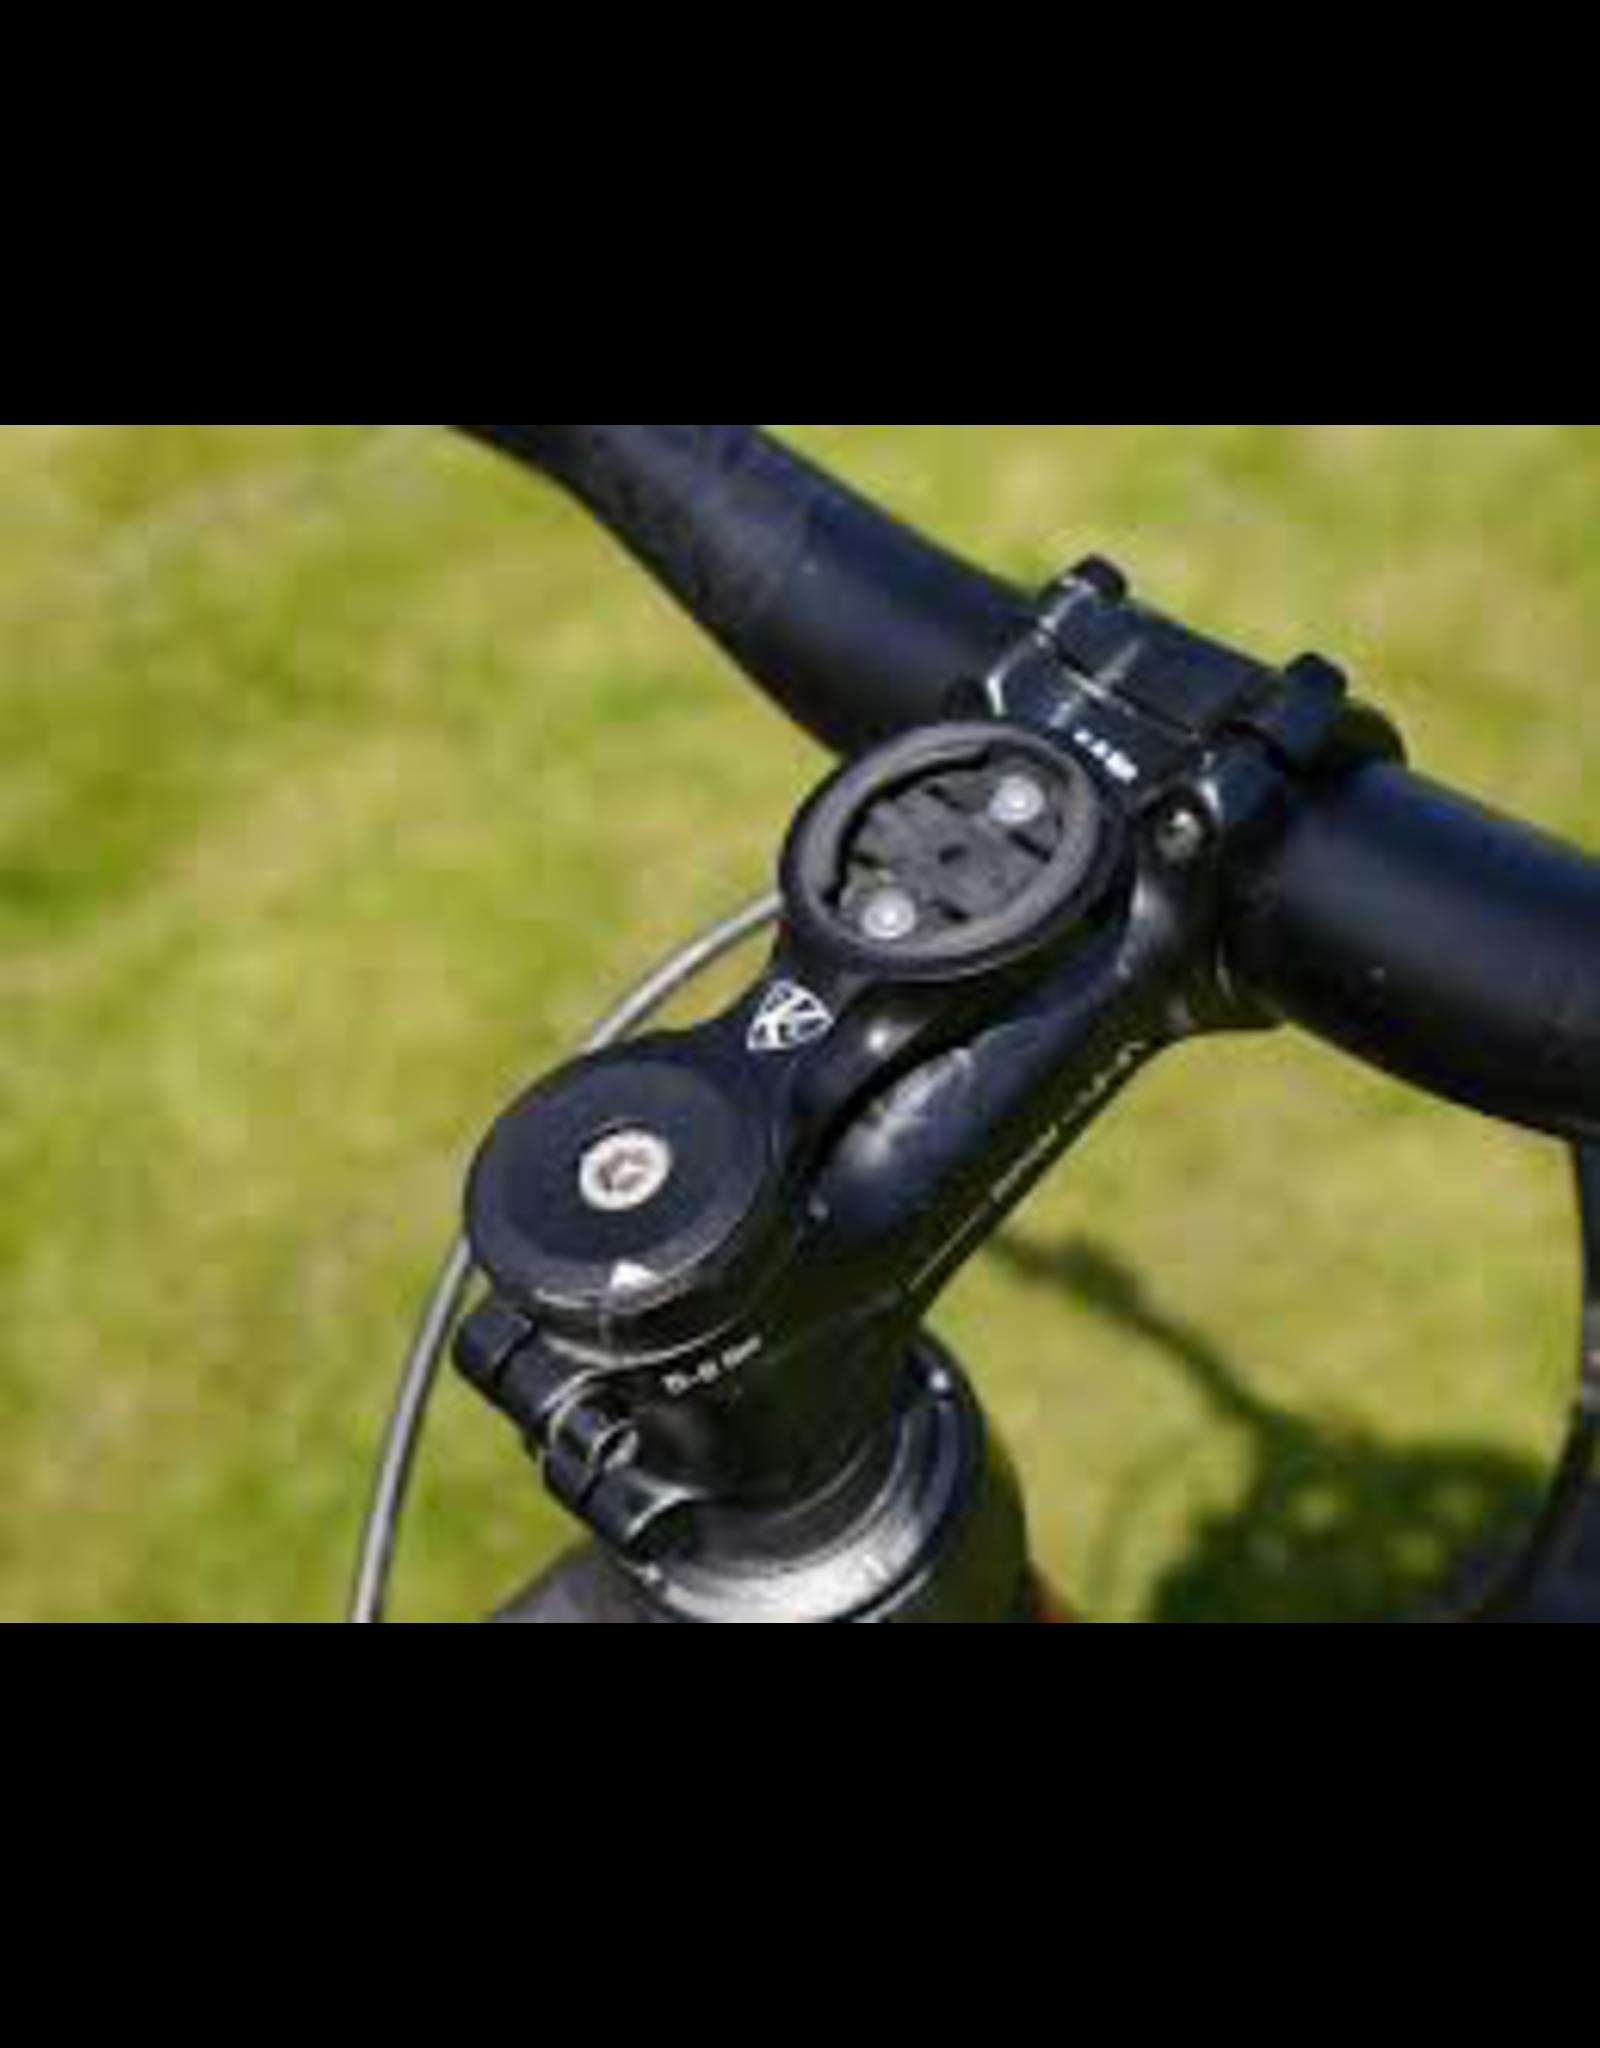 K-EDGE CYCLE COMPUTER K-EDGE STEM FIXED MOUNT FOR GARMIN/BRYTON RED